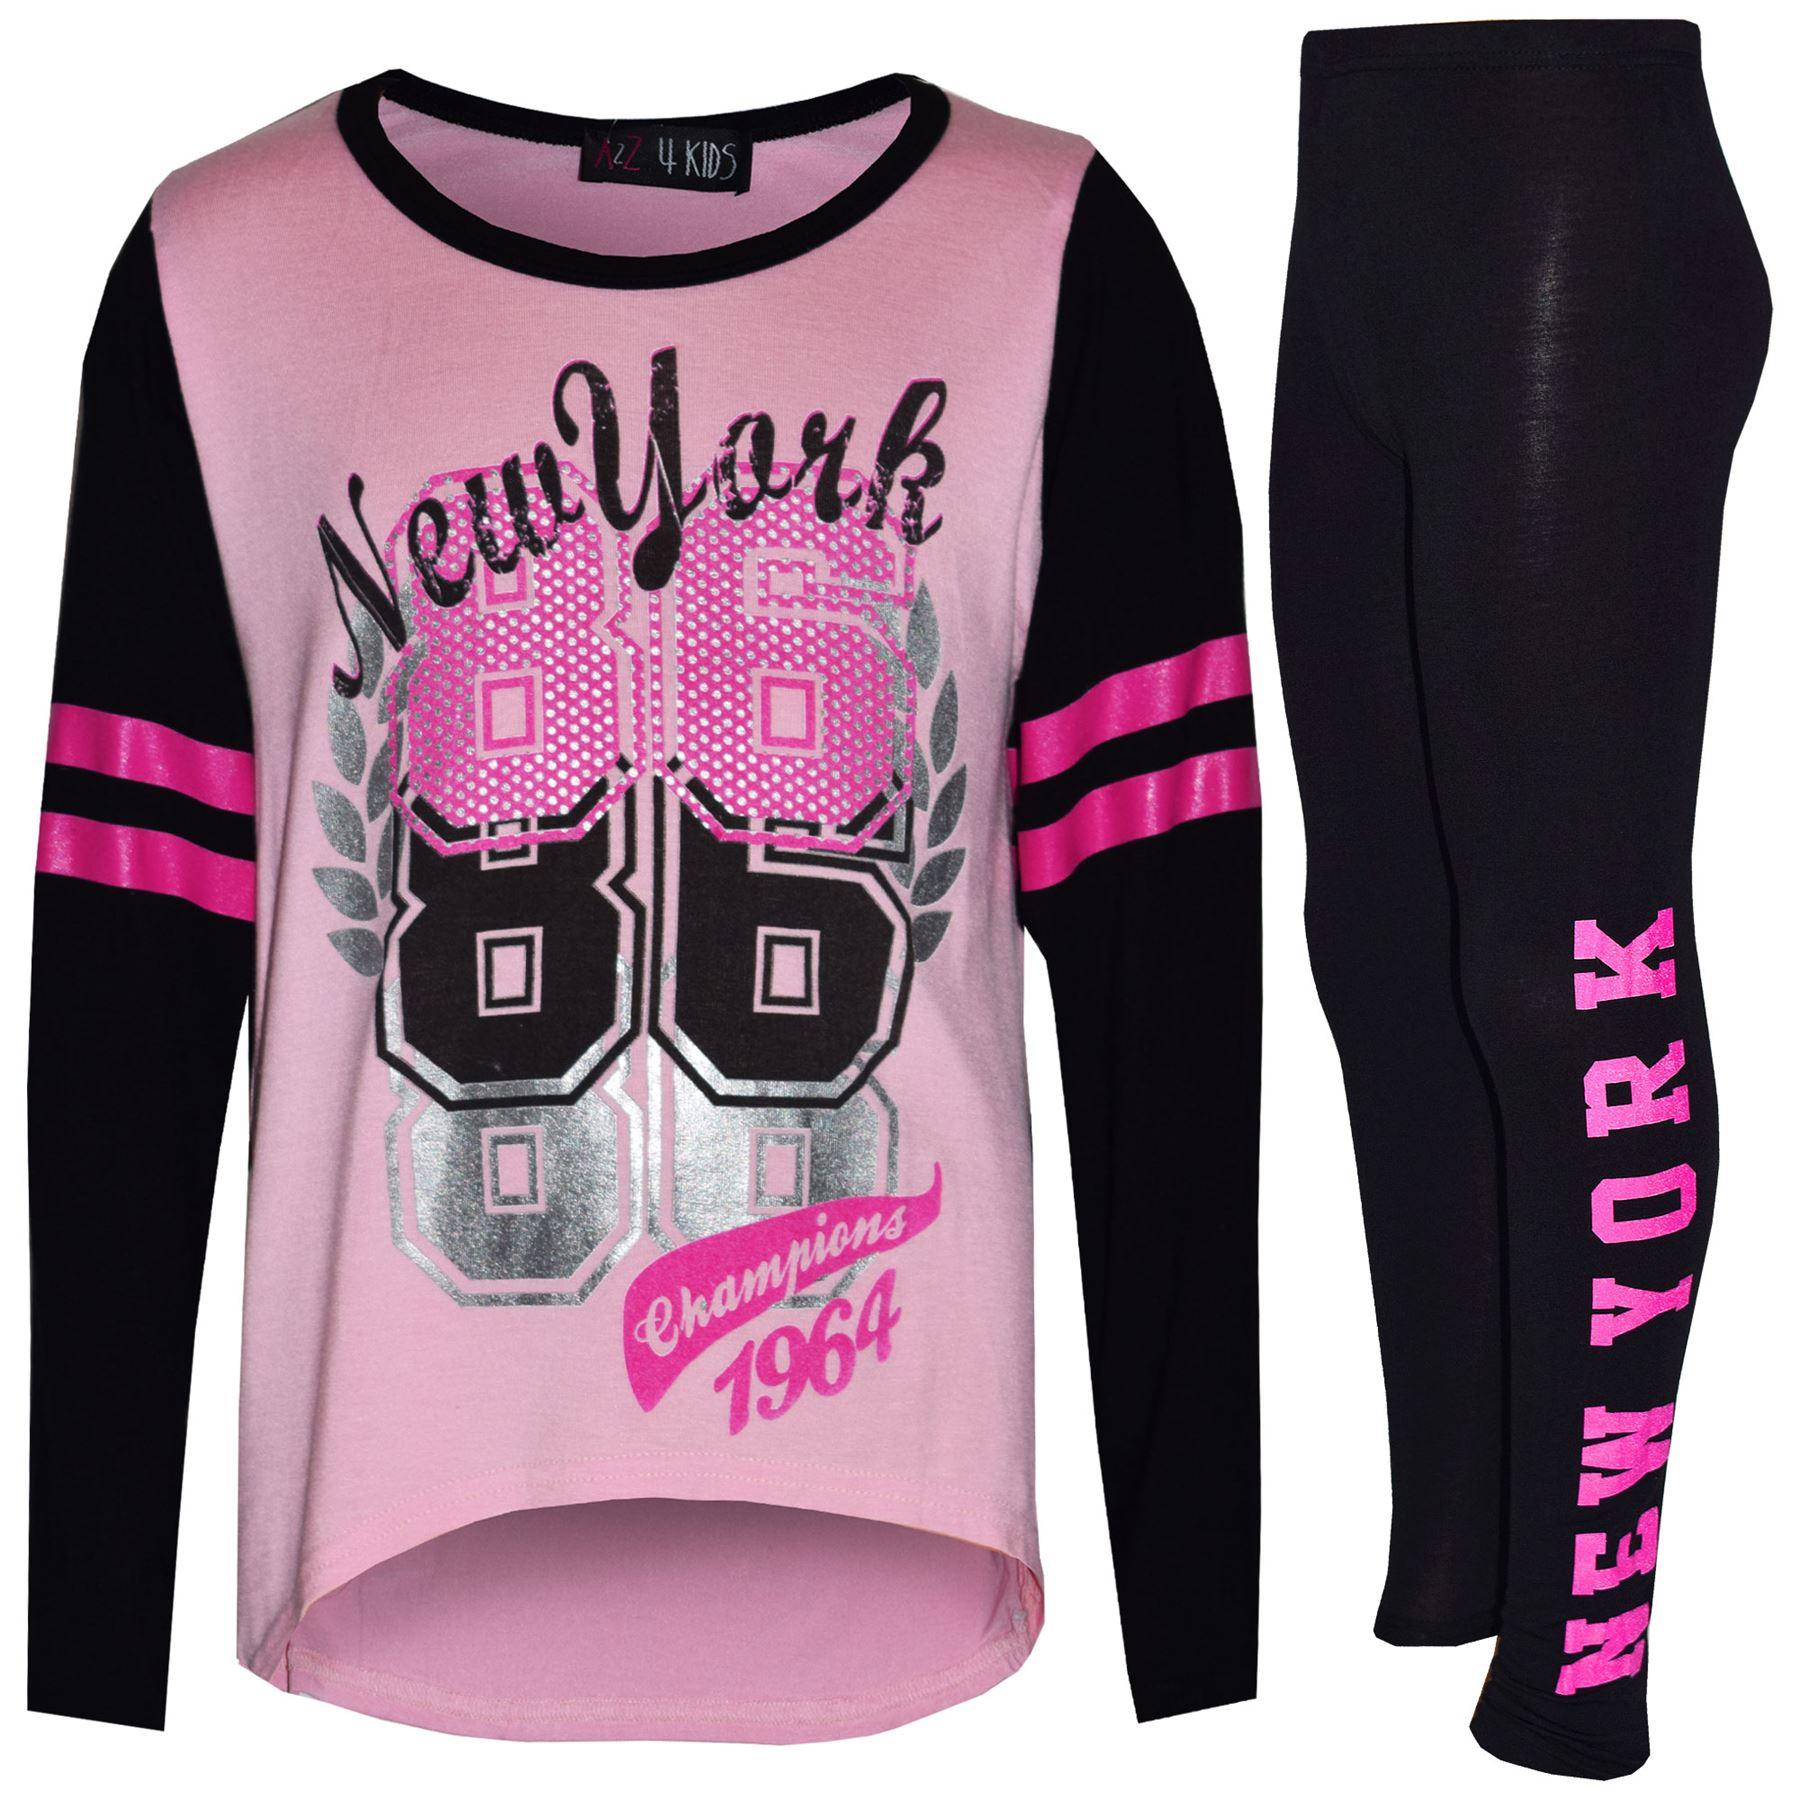 Girls Top Kids New York 86 Print Fashion Tops /& Stylish Legging Set 7-13 Years